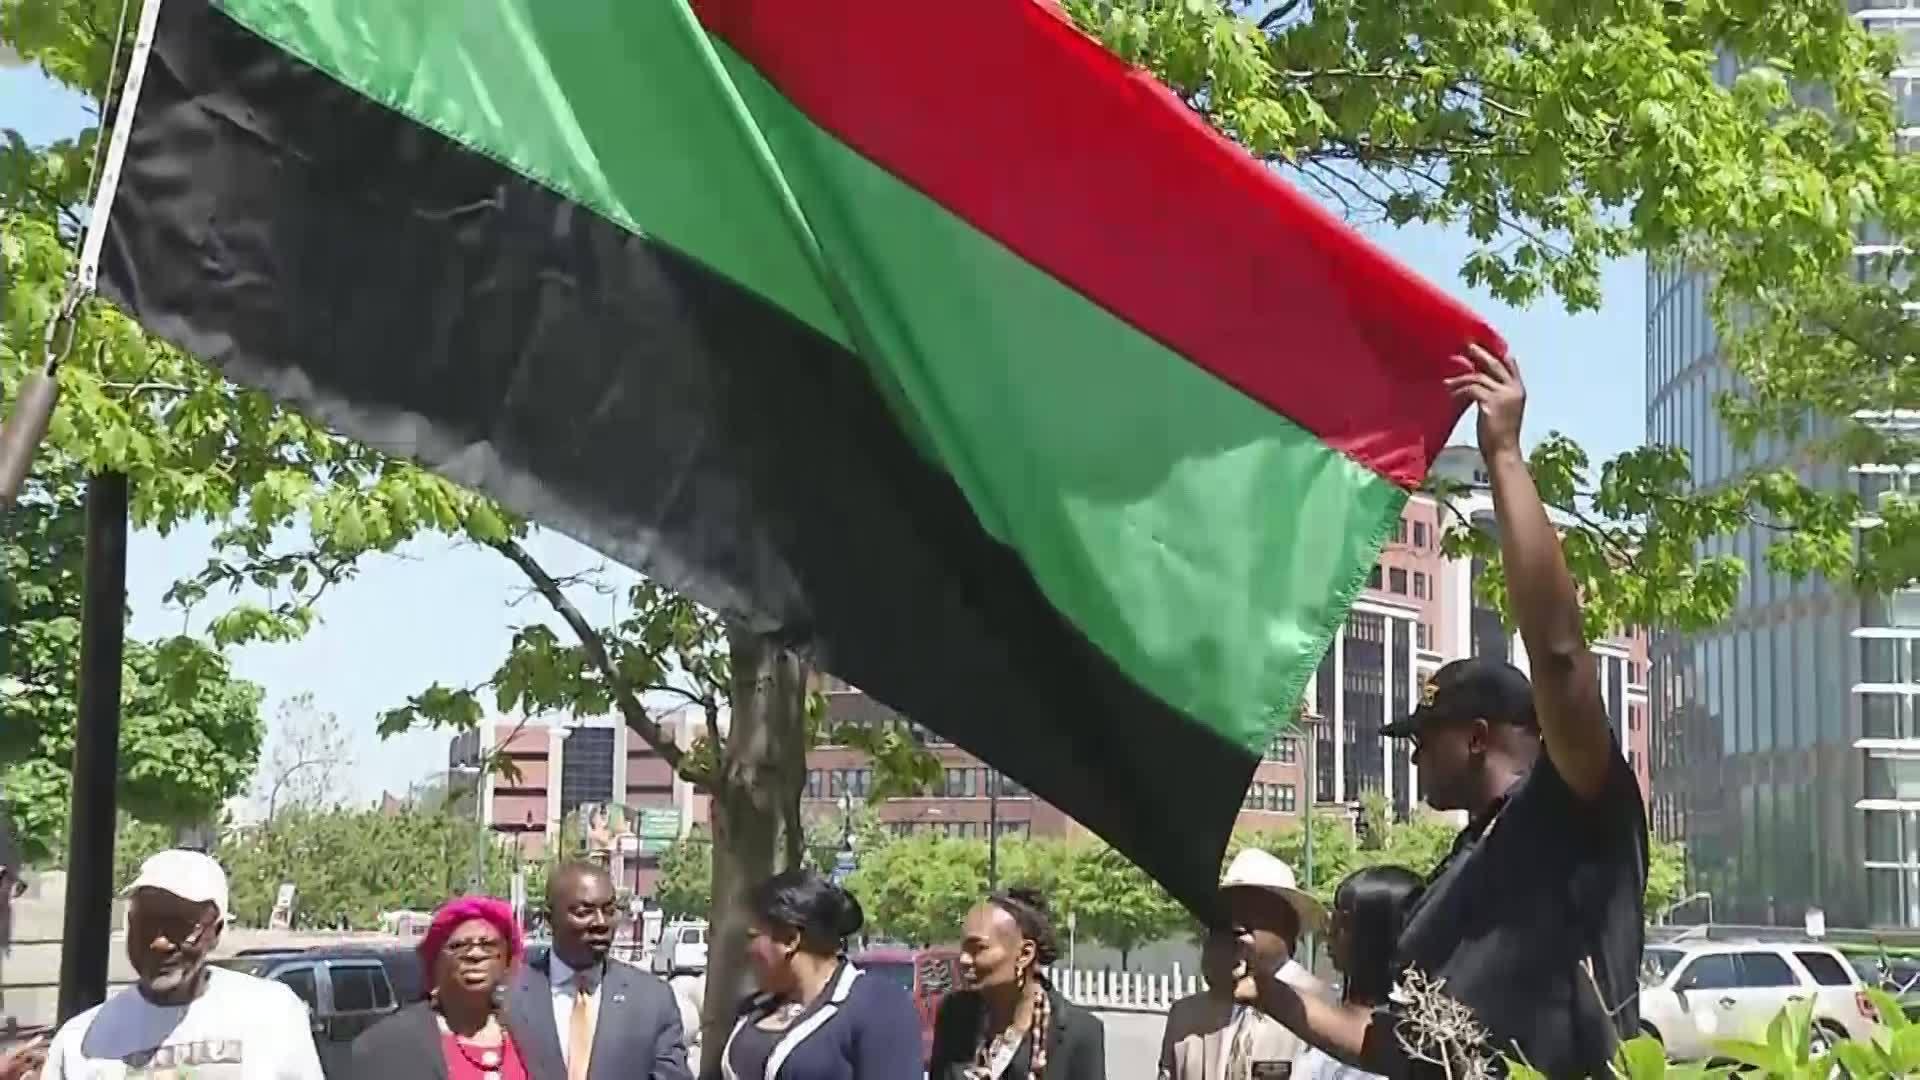 Juneteenth flag raised in Buffalo